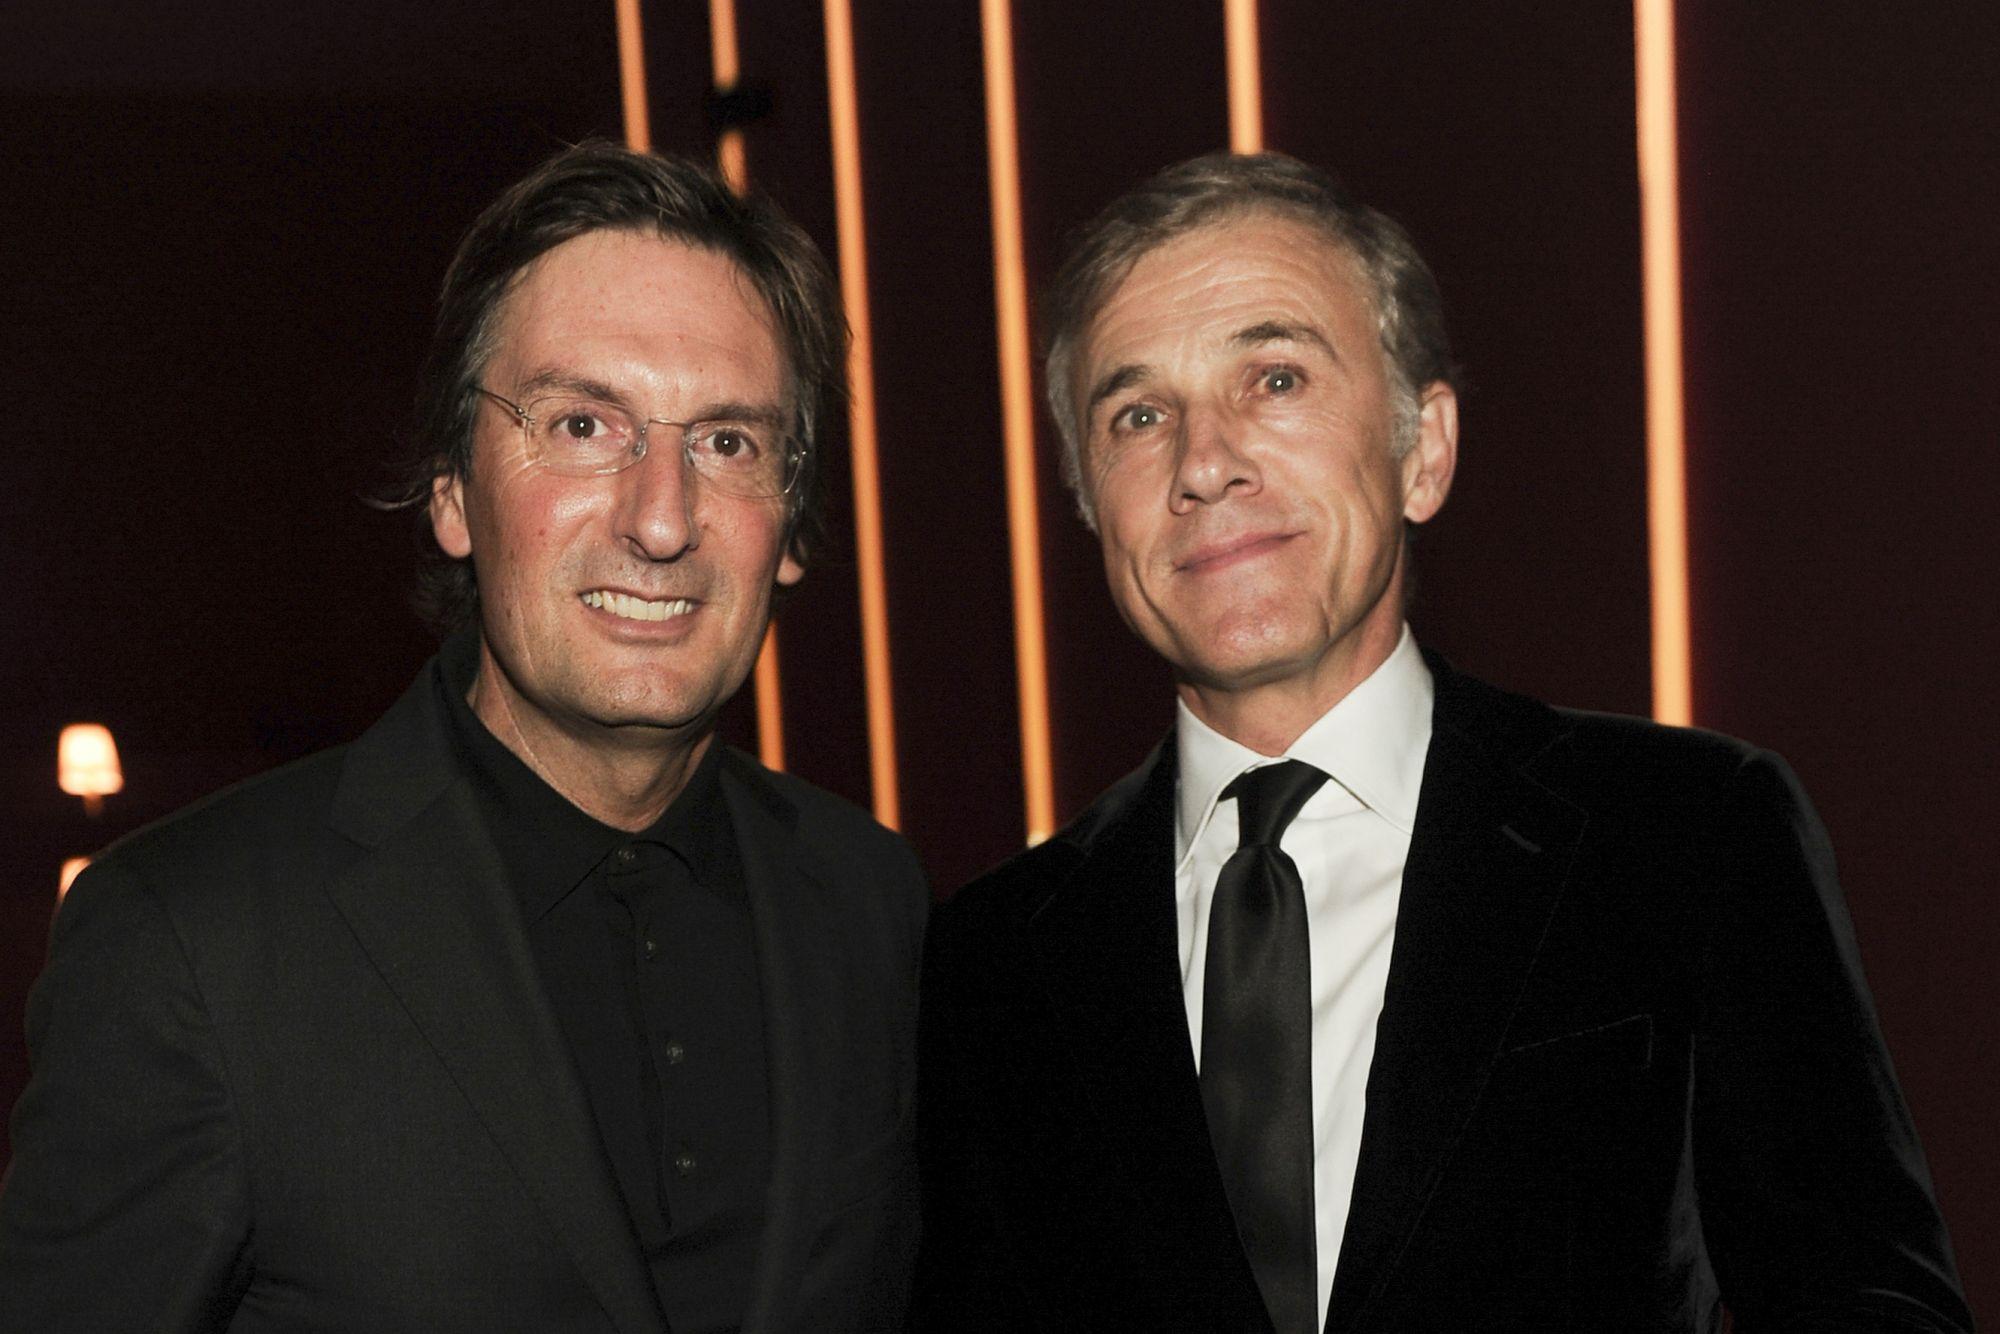 Pietro Beccari, Christophe Waltz